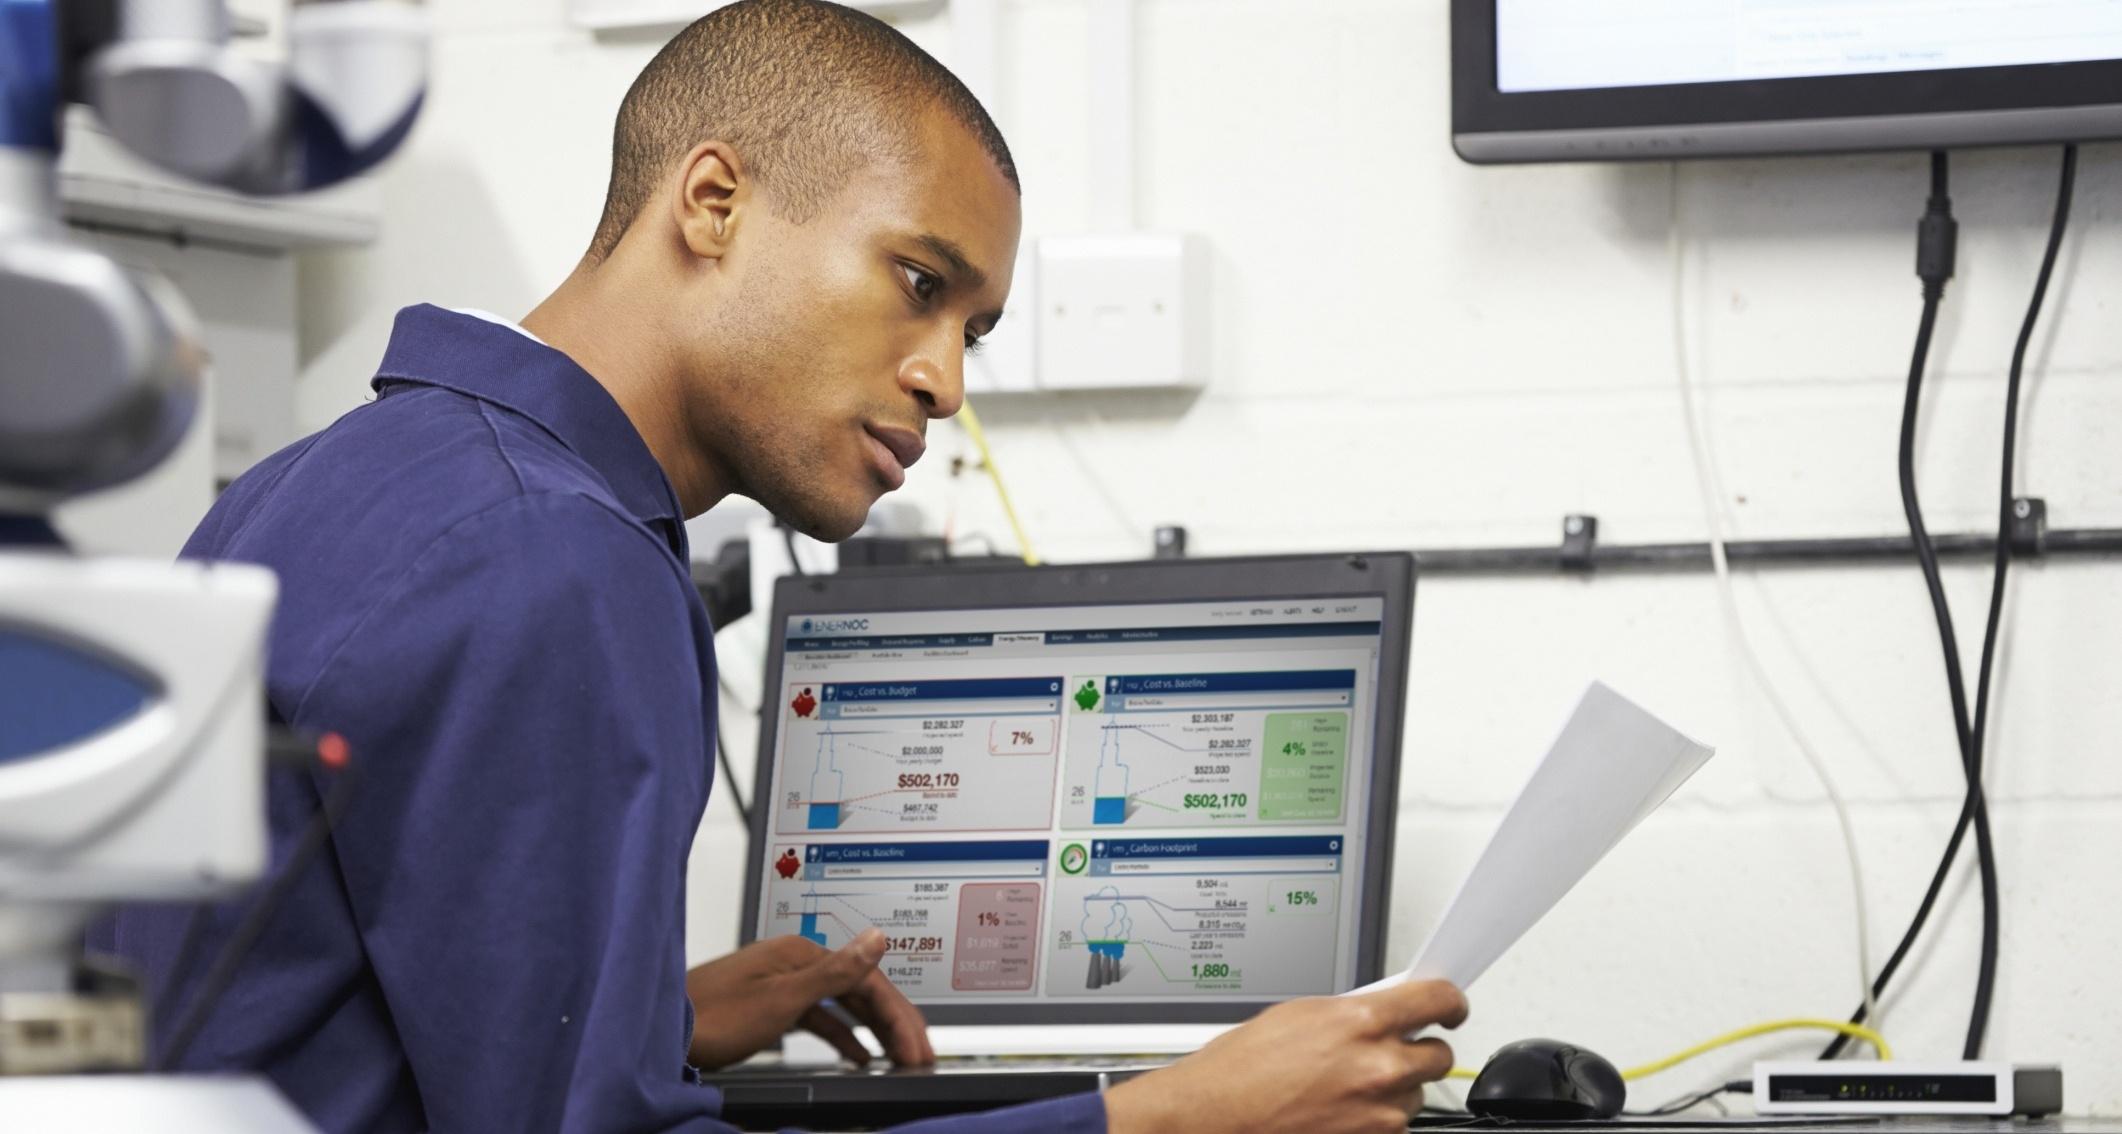 3.2_Building_Energy_Management_Systems-005408-edited.jpg